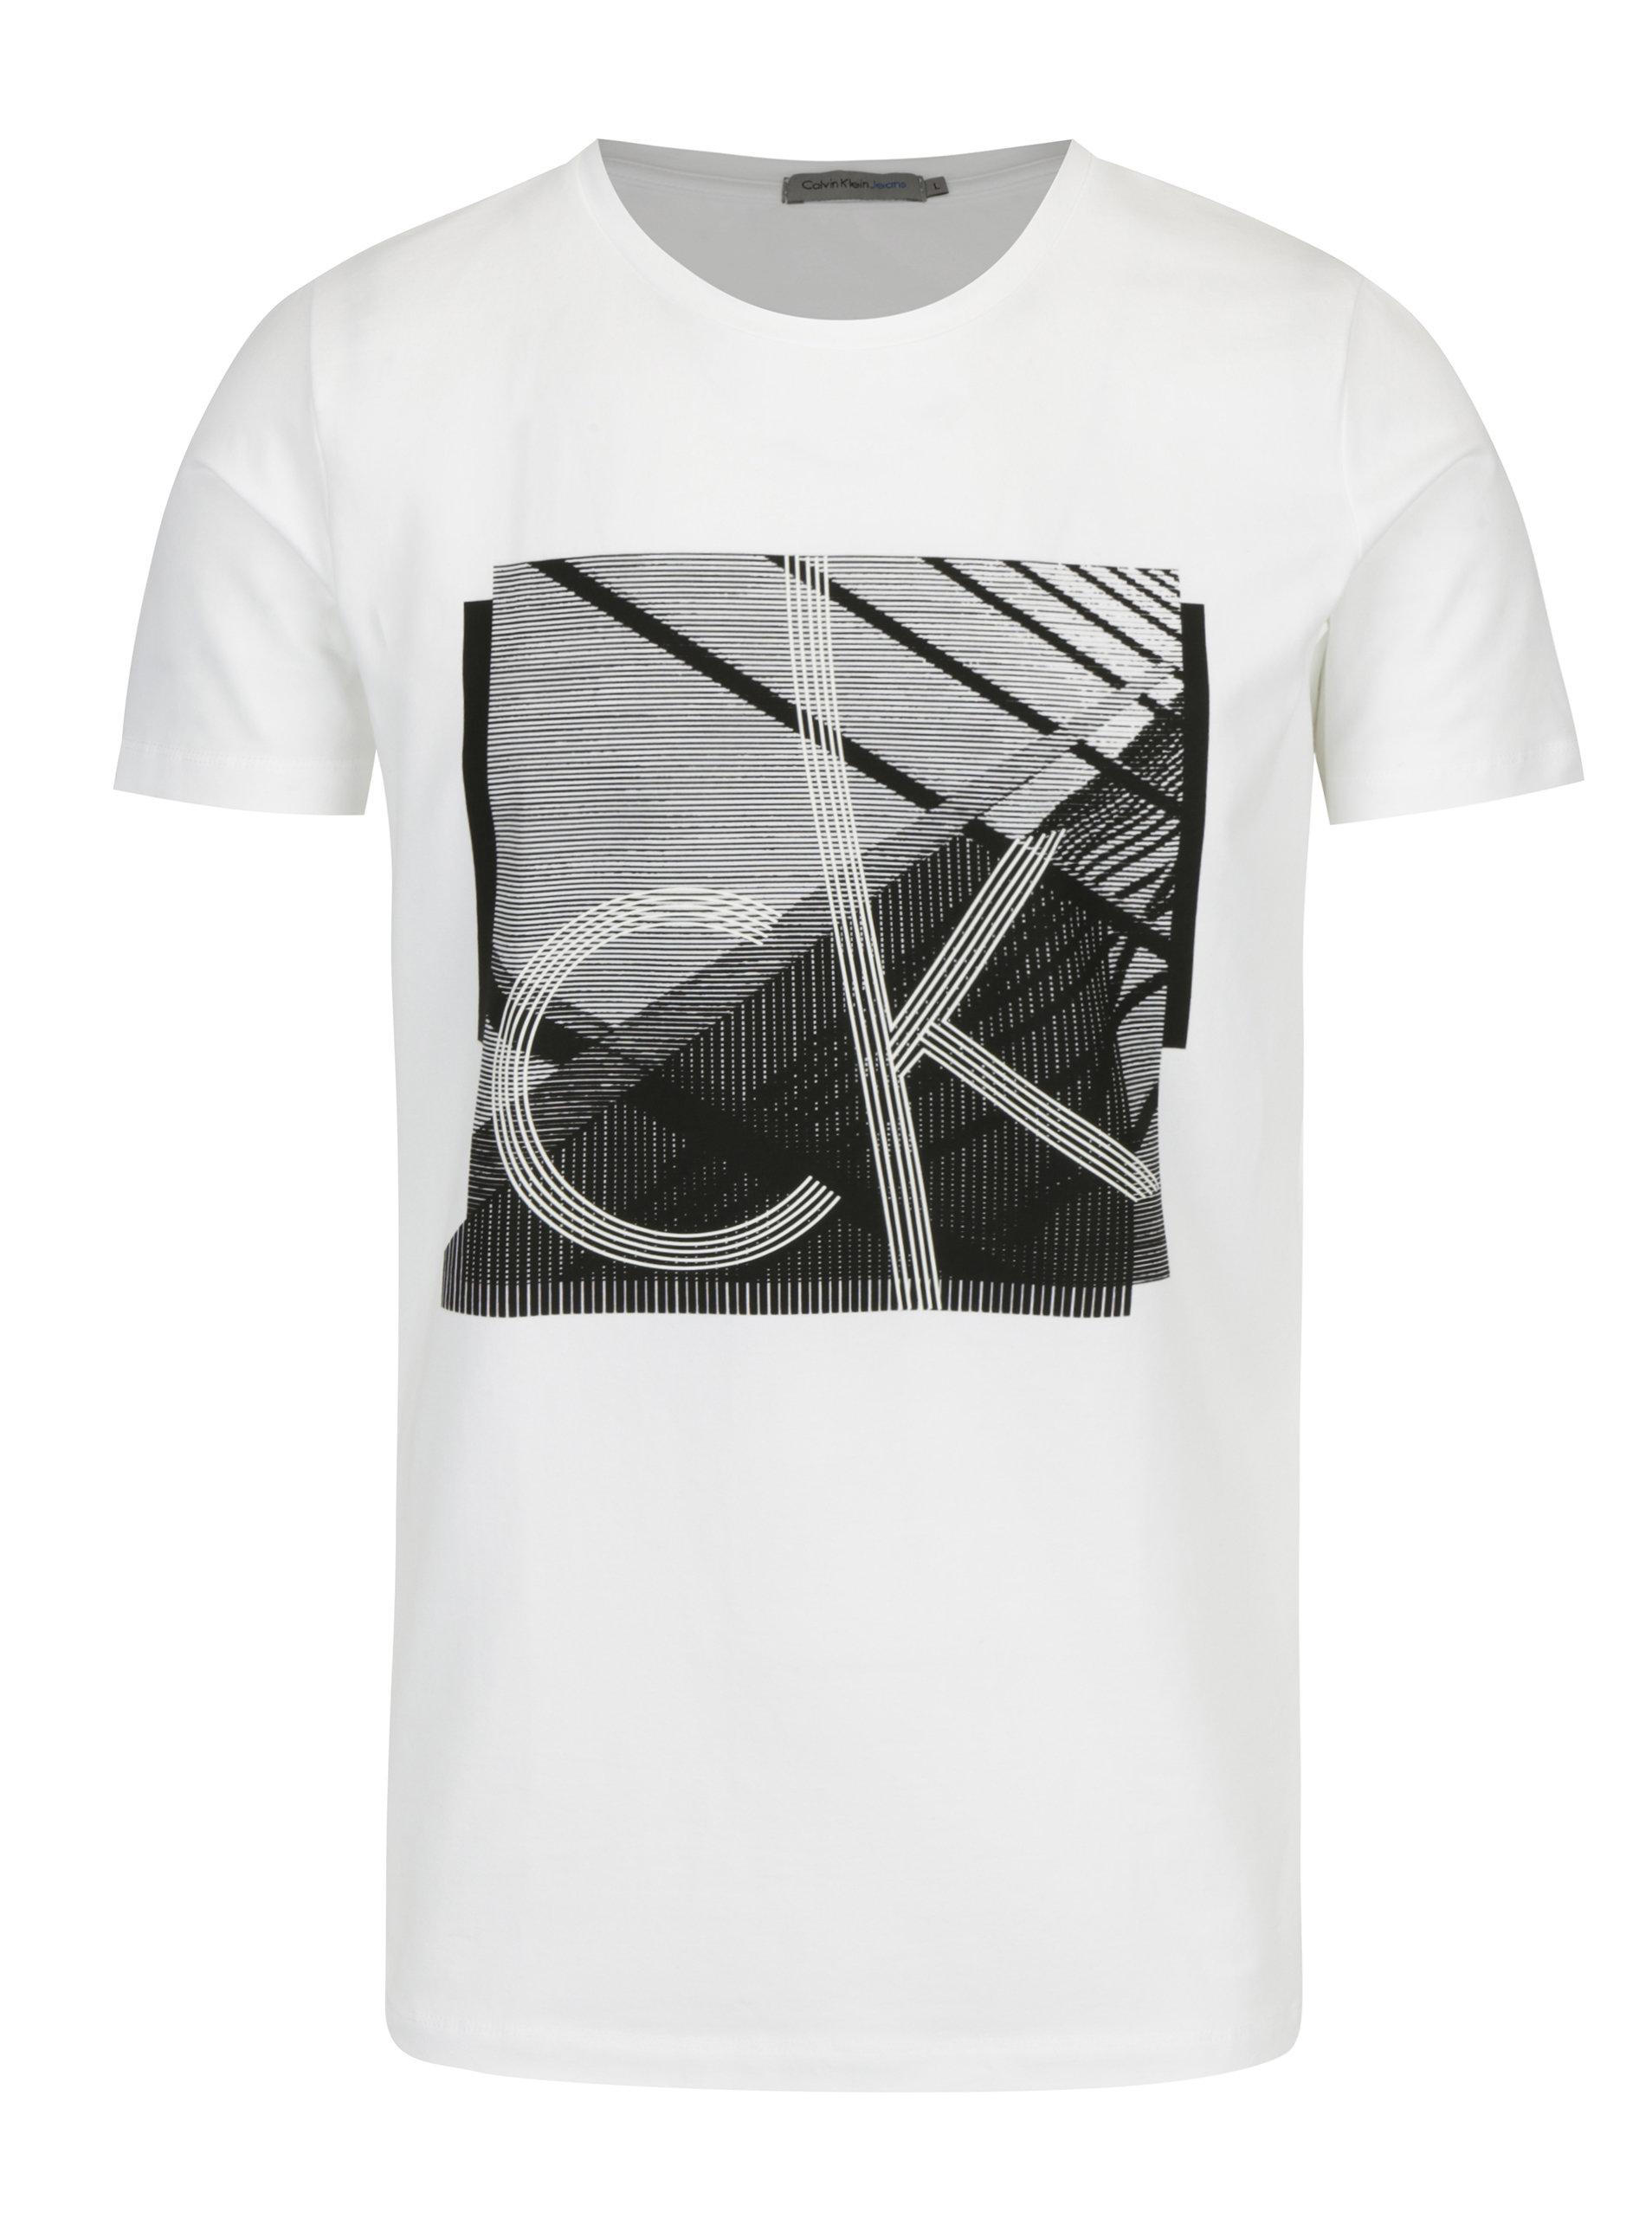 8f4eeae39 Bílé pánské tričko s černým potiskem Calvin Klein Jeans Tradon ...